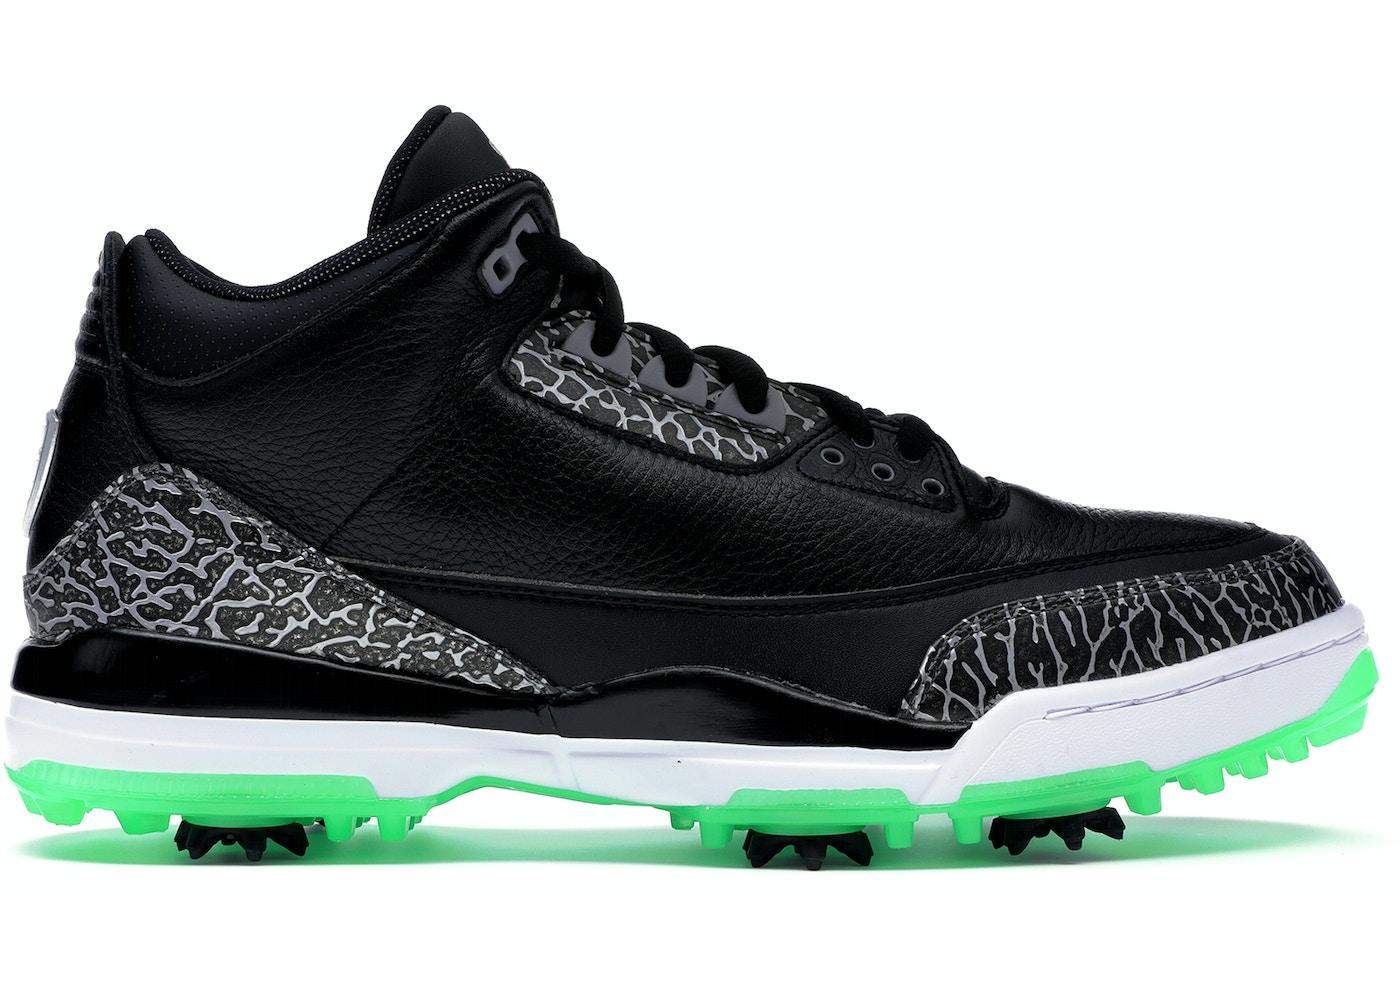 4514b39f2509 Jordan 3 Retro Golf Black Green Glow - AJ3783-001